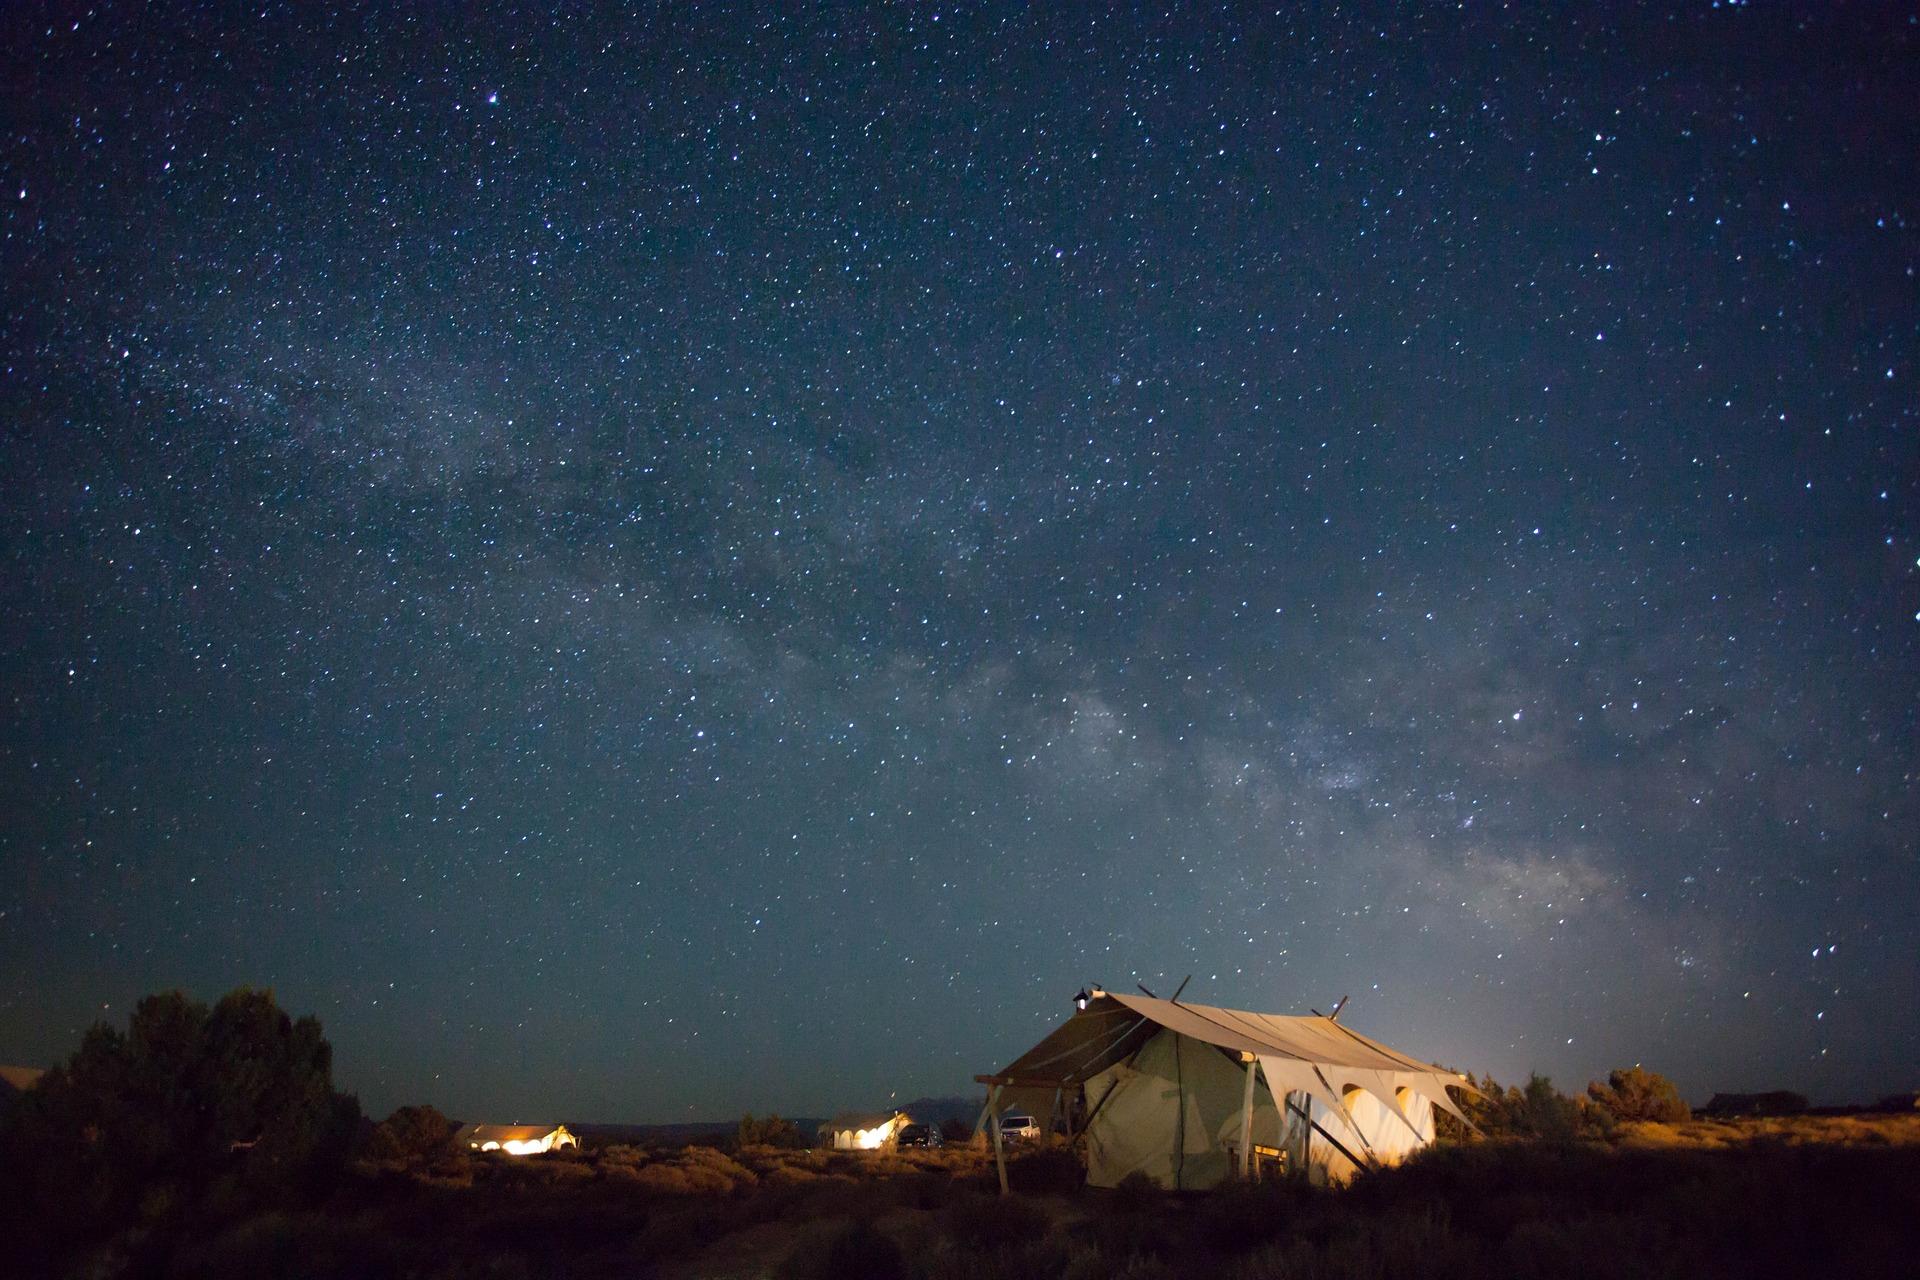 Big tent under a night sky.